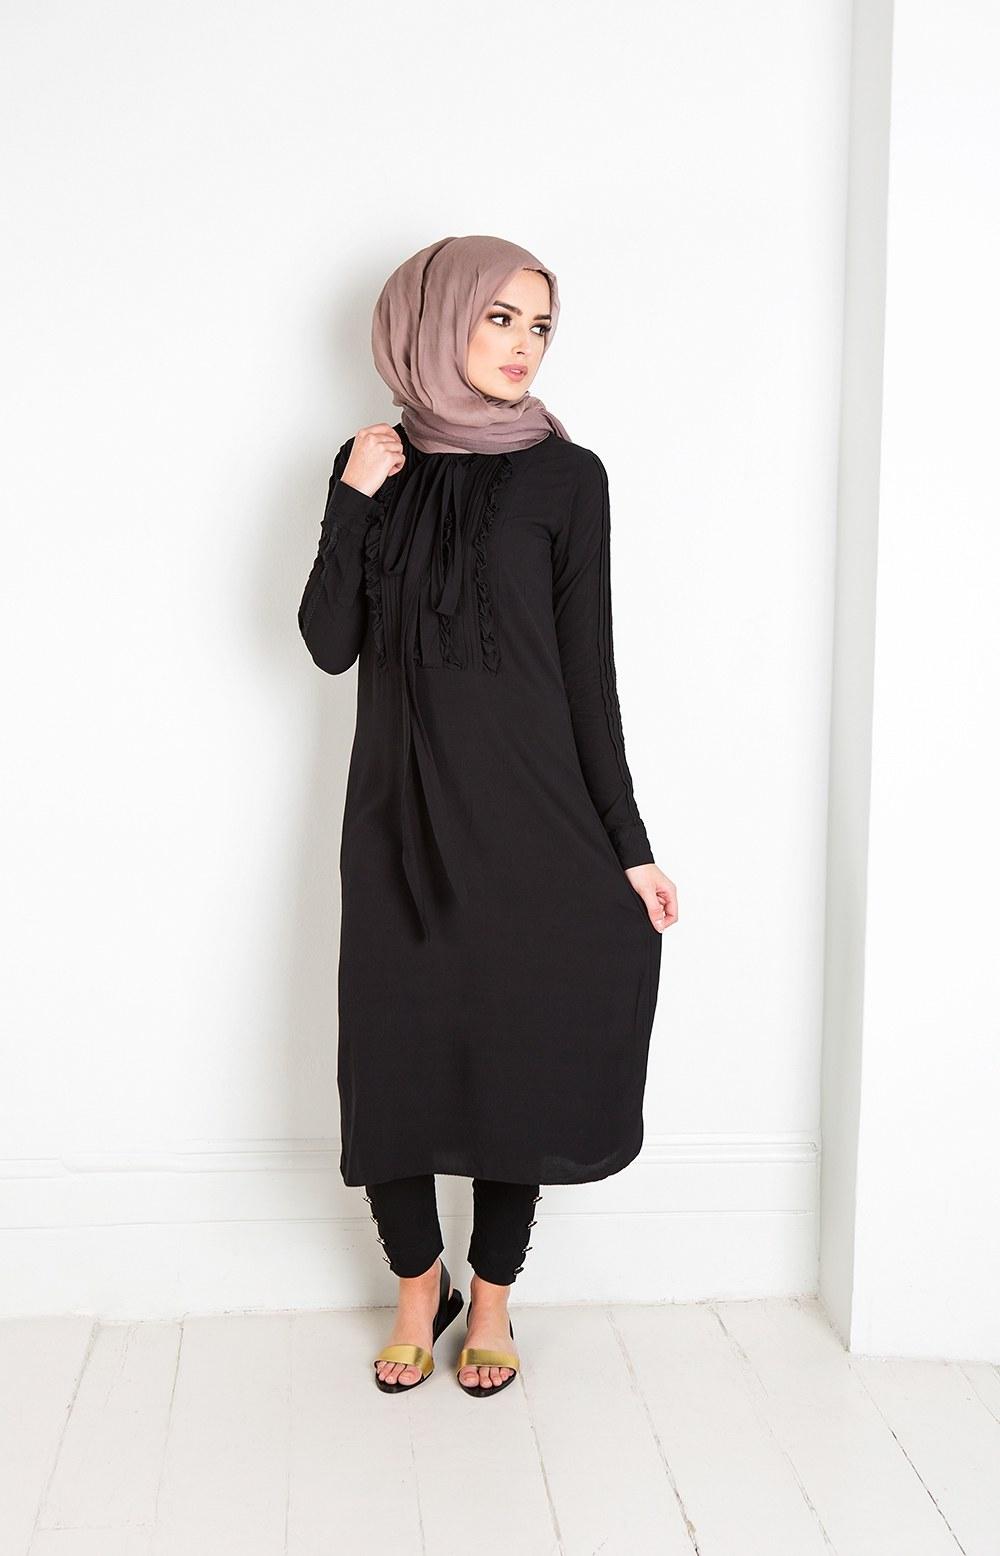 Ide Model Baju Lebaran Baru Etdg 25 Trend Model Baju Muslim Lebaran 2018 Simple & Modis